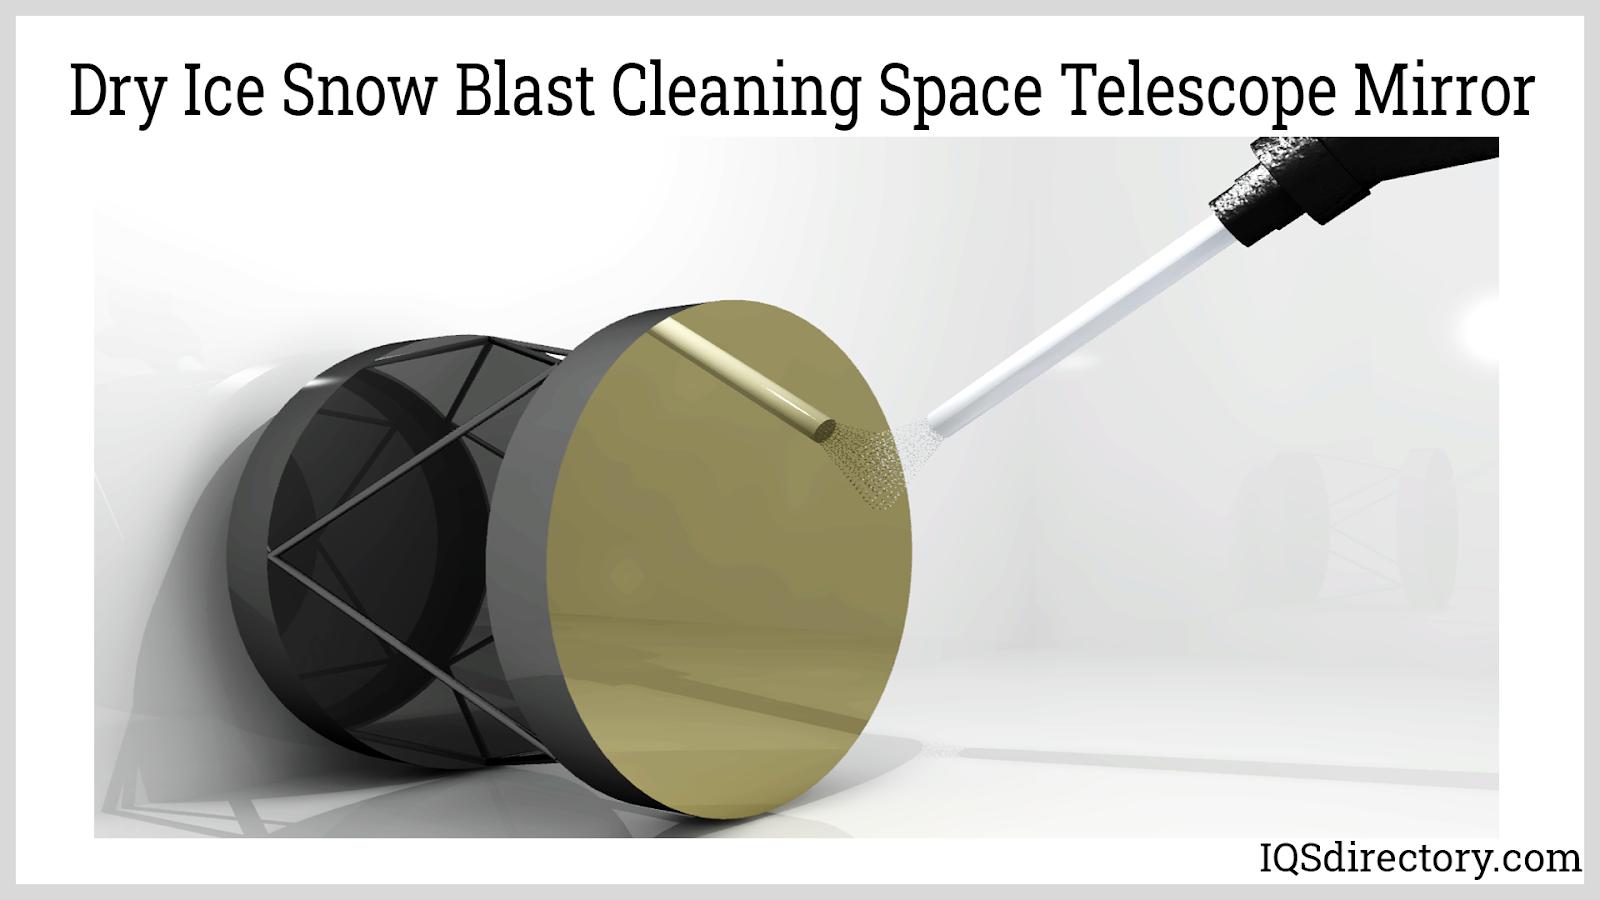 Dry Ice Snow Blast Cleaning Space Telescope Mirror